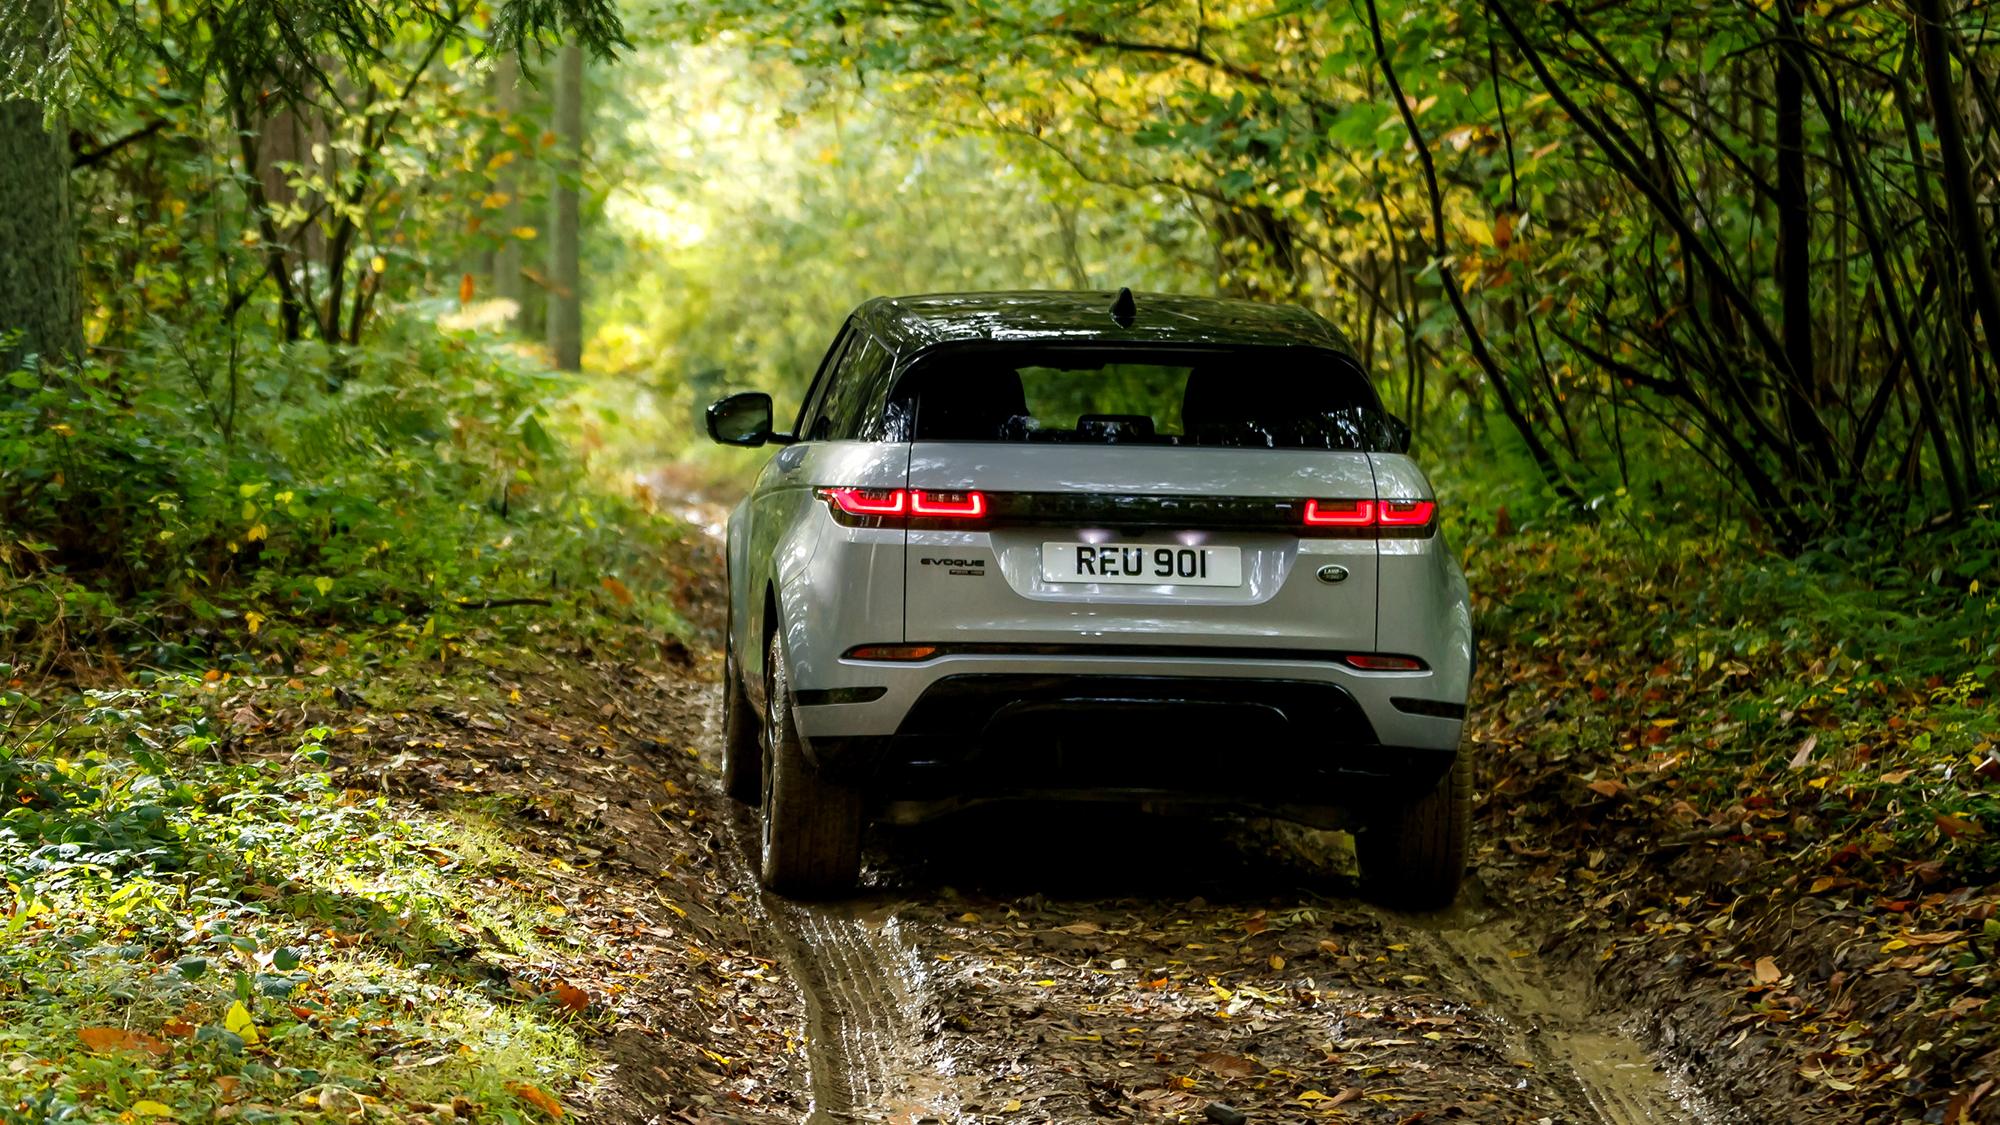 Range Rover Key Fob Sync